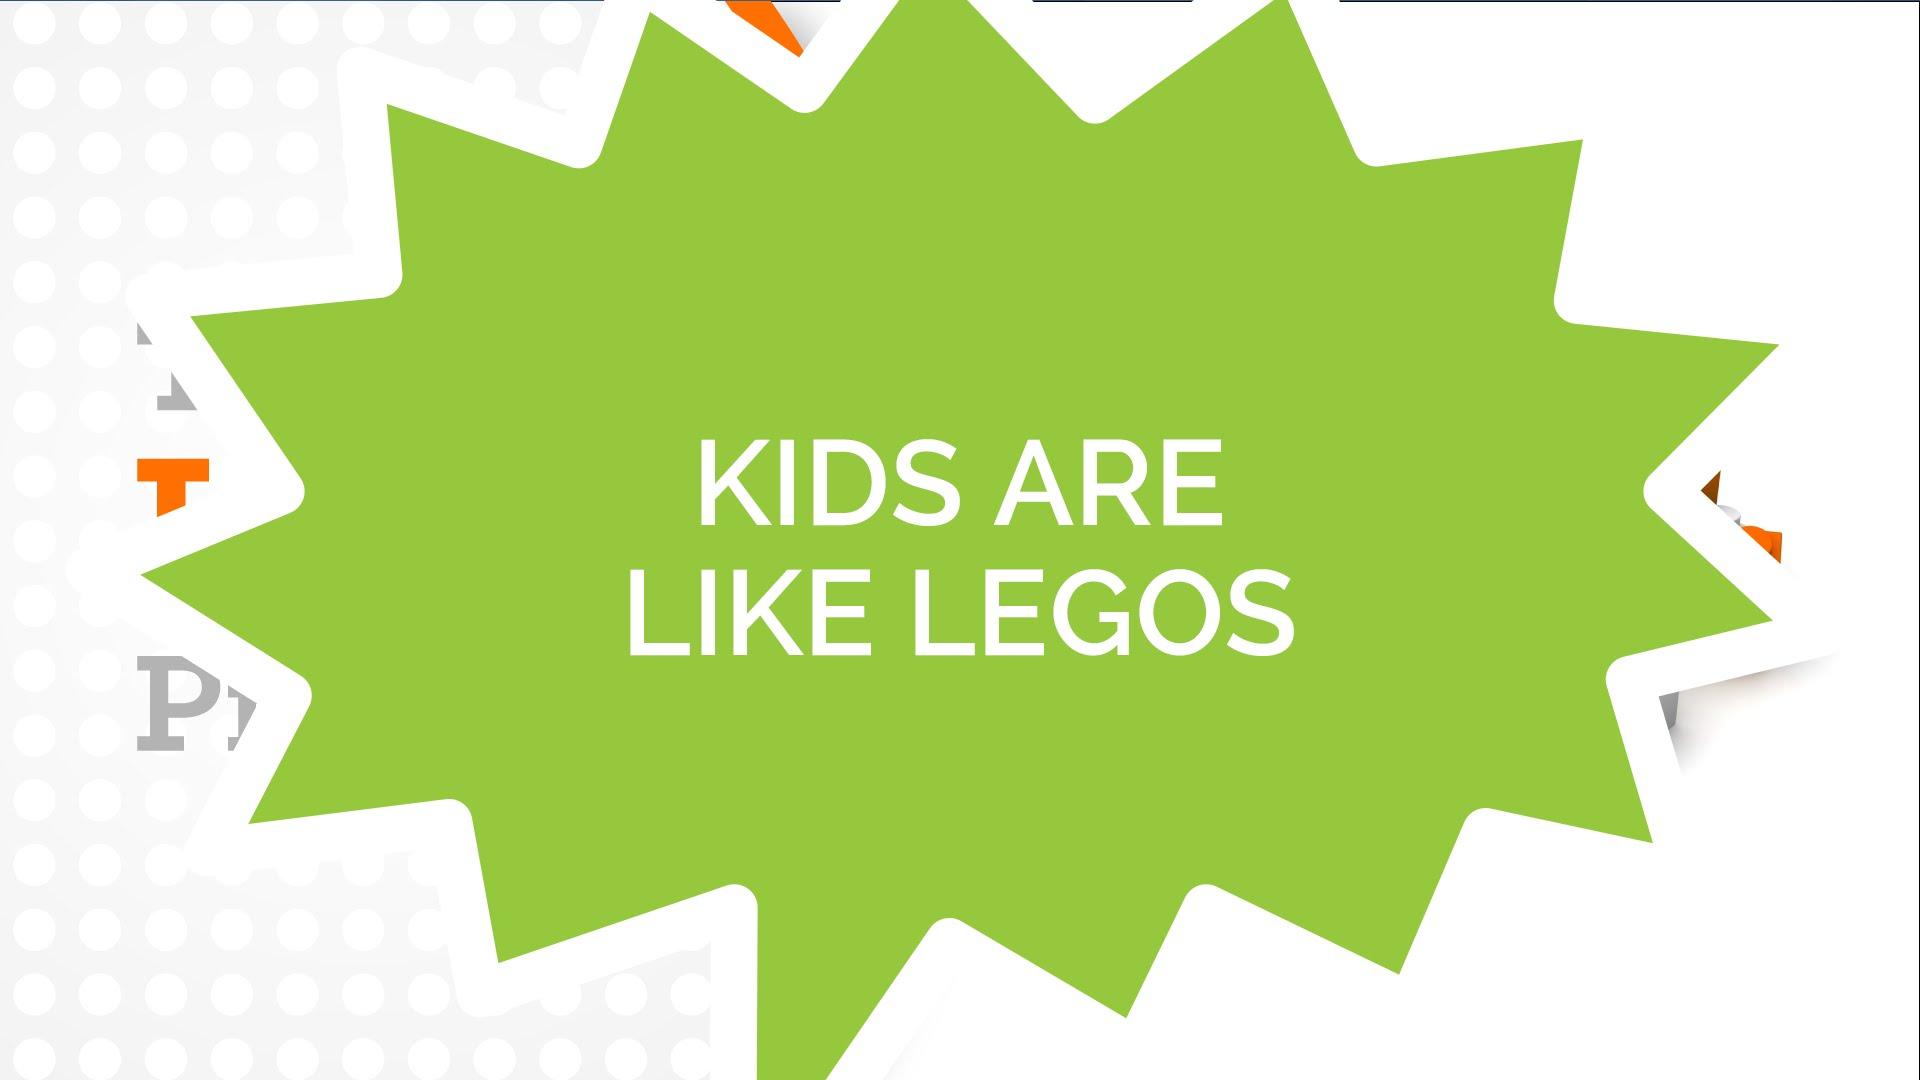 Lego Principle #1 – Kids Are Like Legos